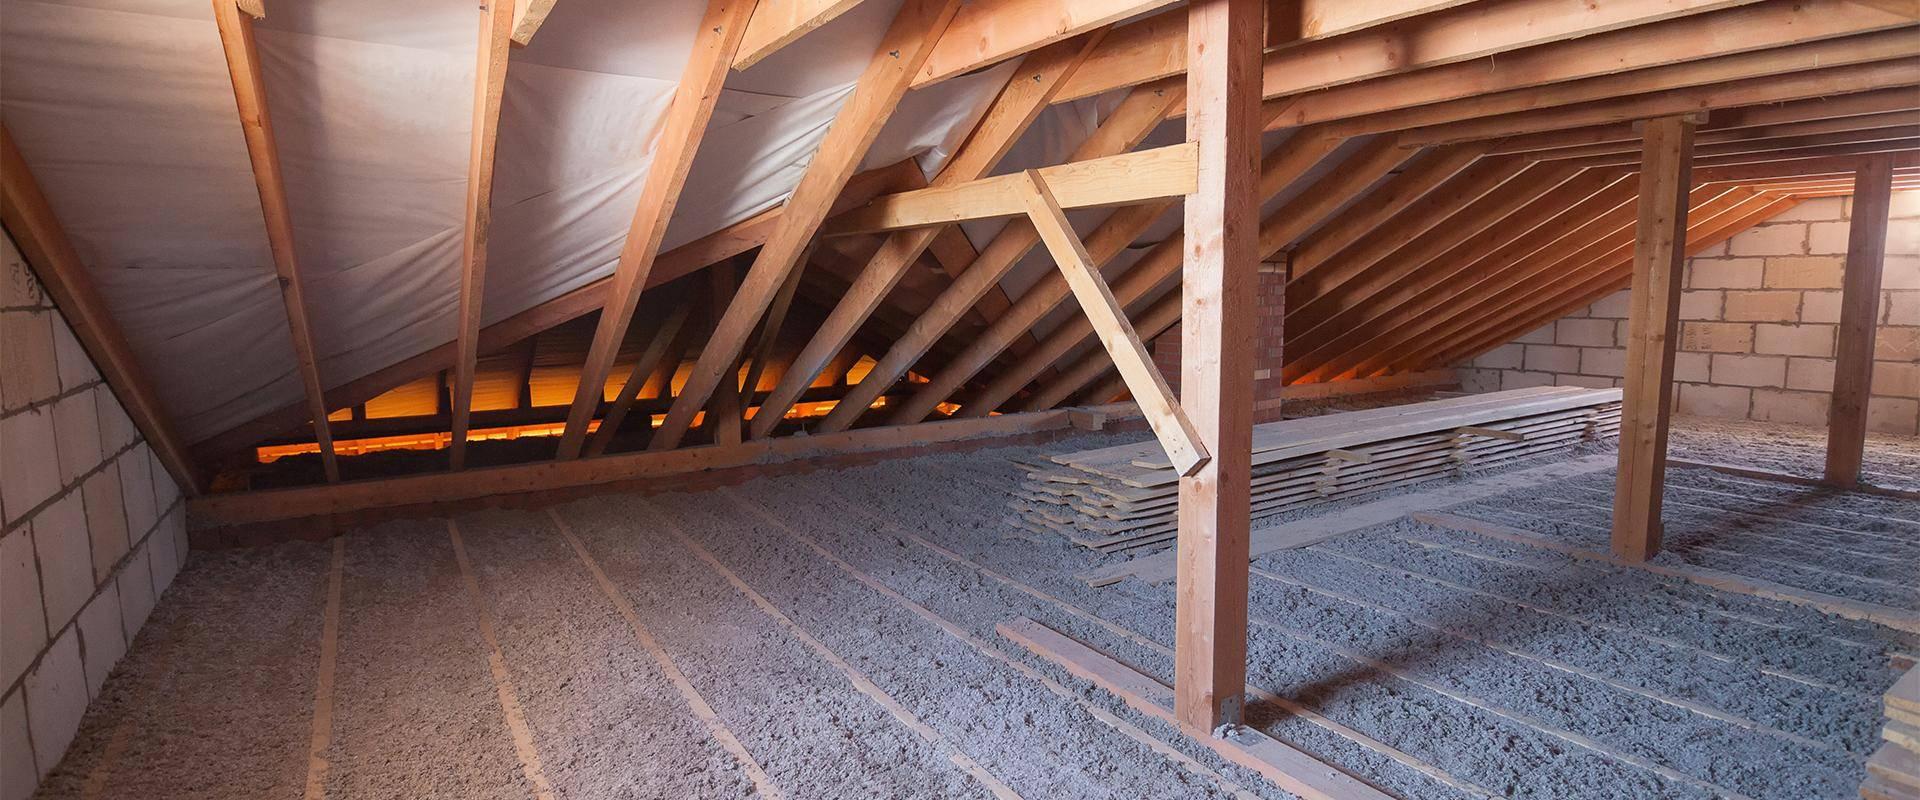 inside of an attic